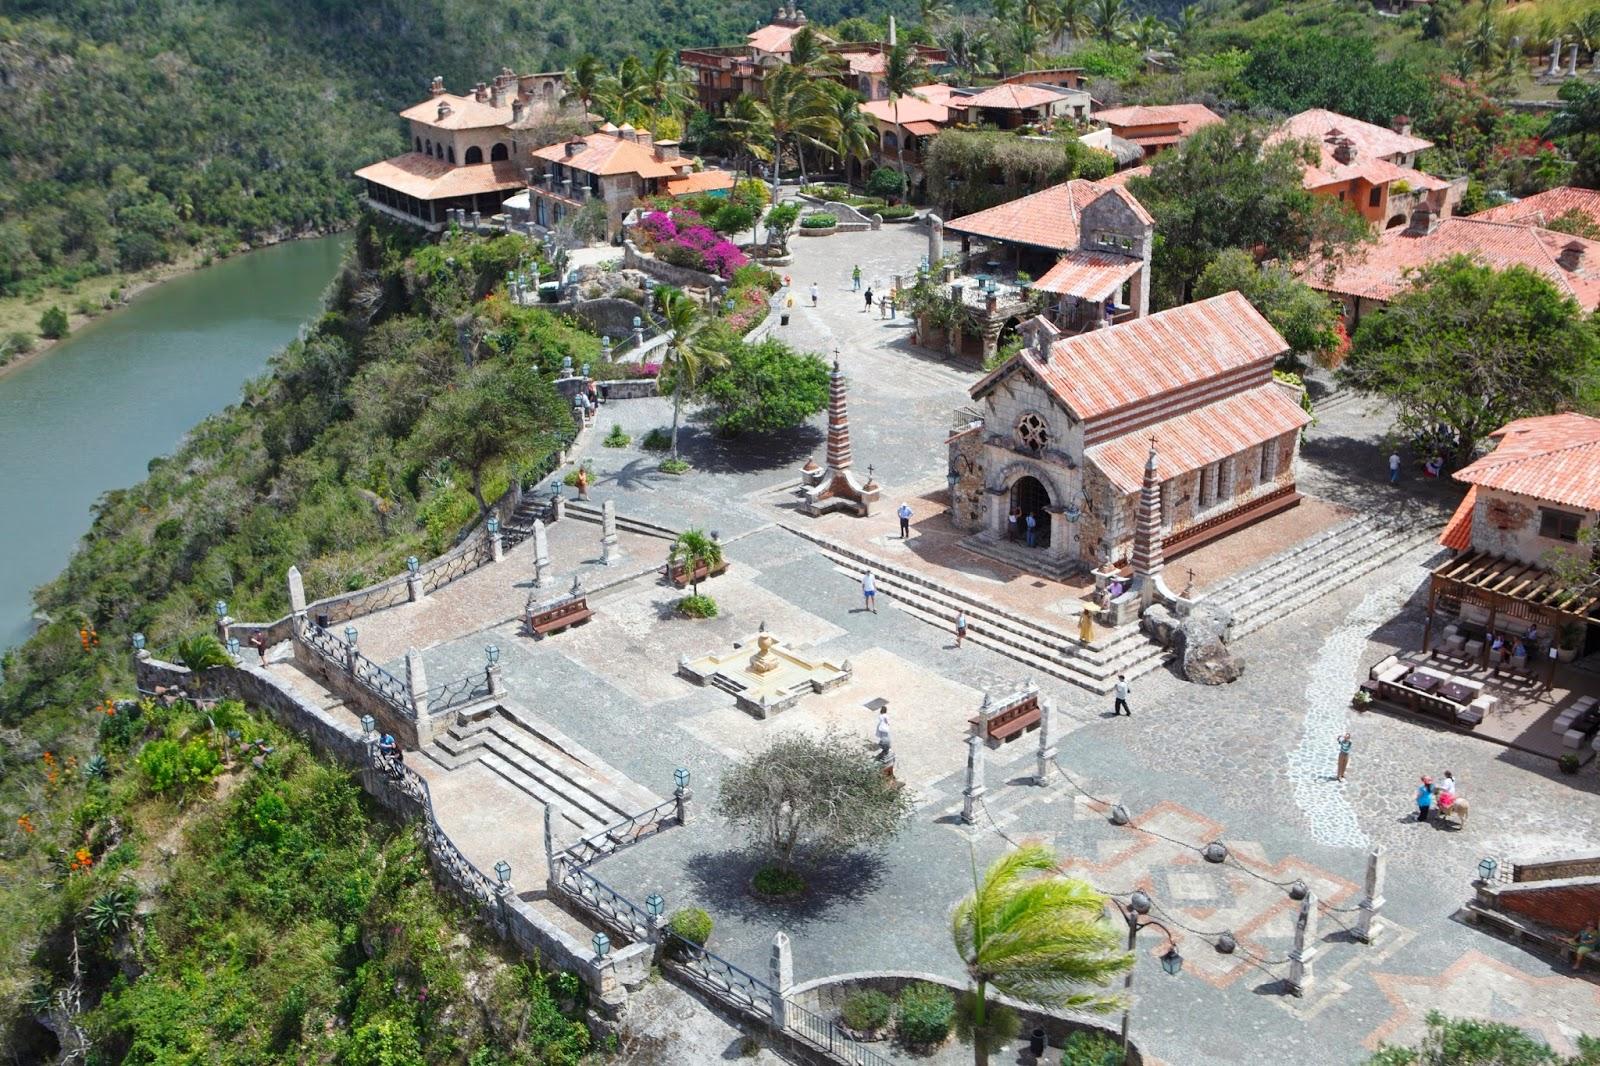 Dominicana En Romana Parques La Republica Los